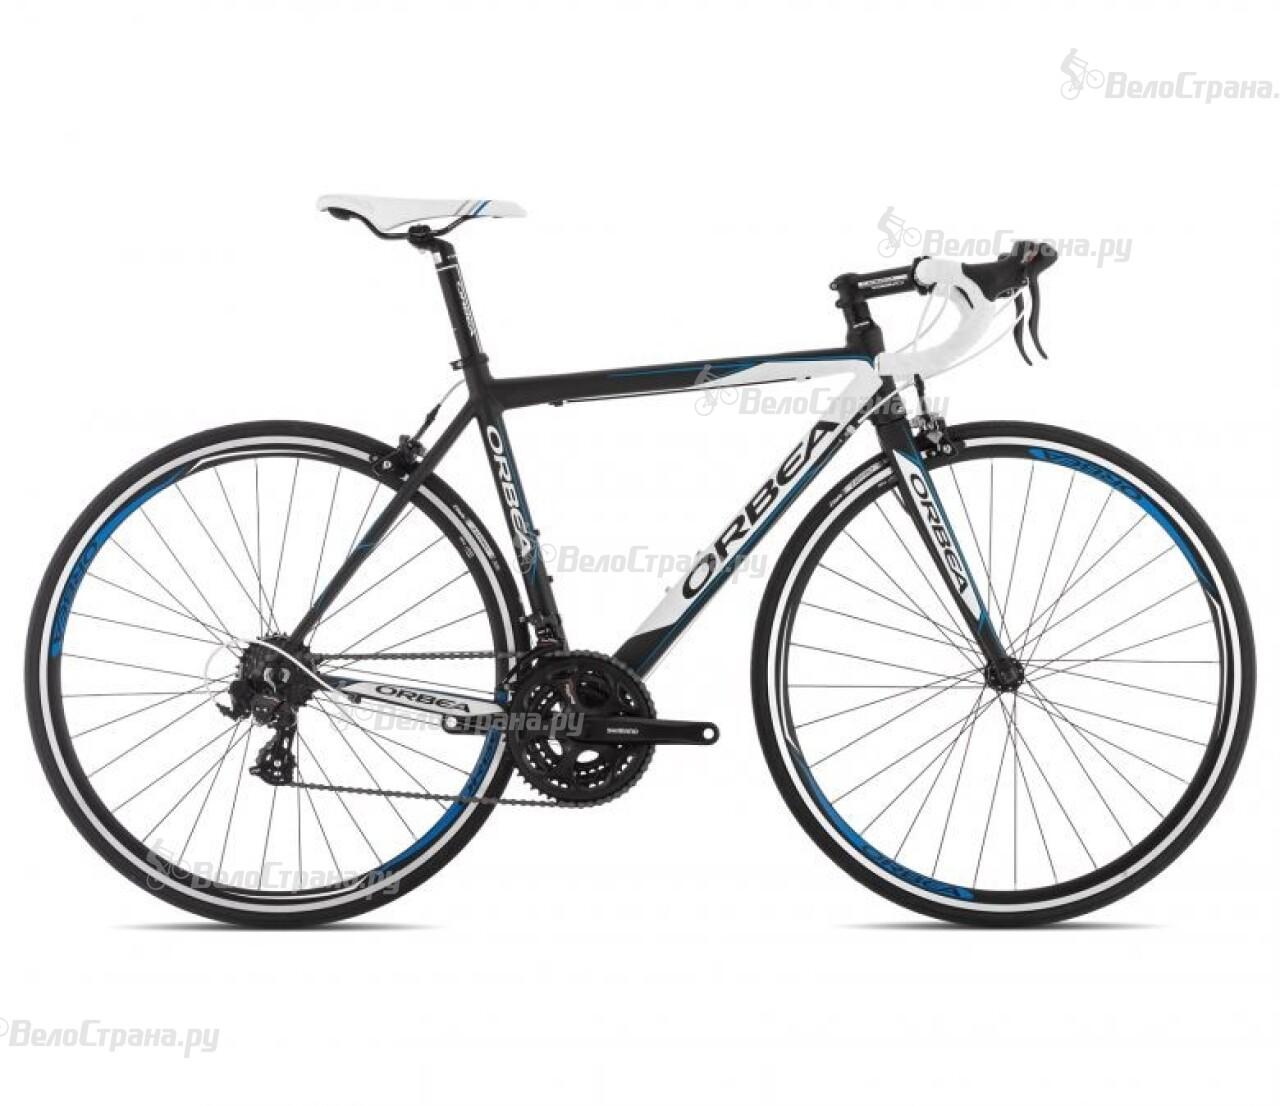 Велосипед Orbea Aqua 70 (2014)